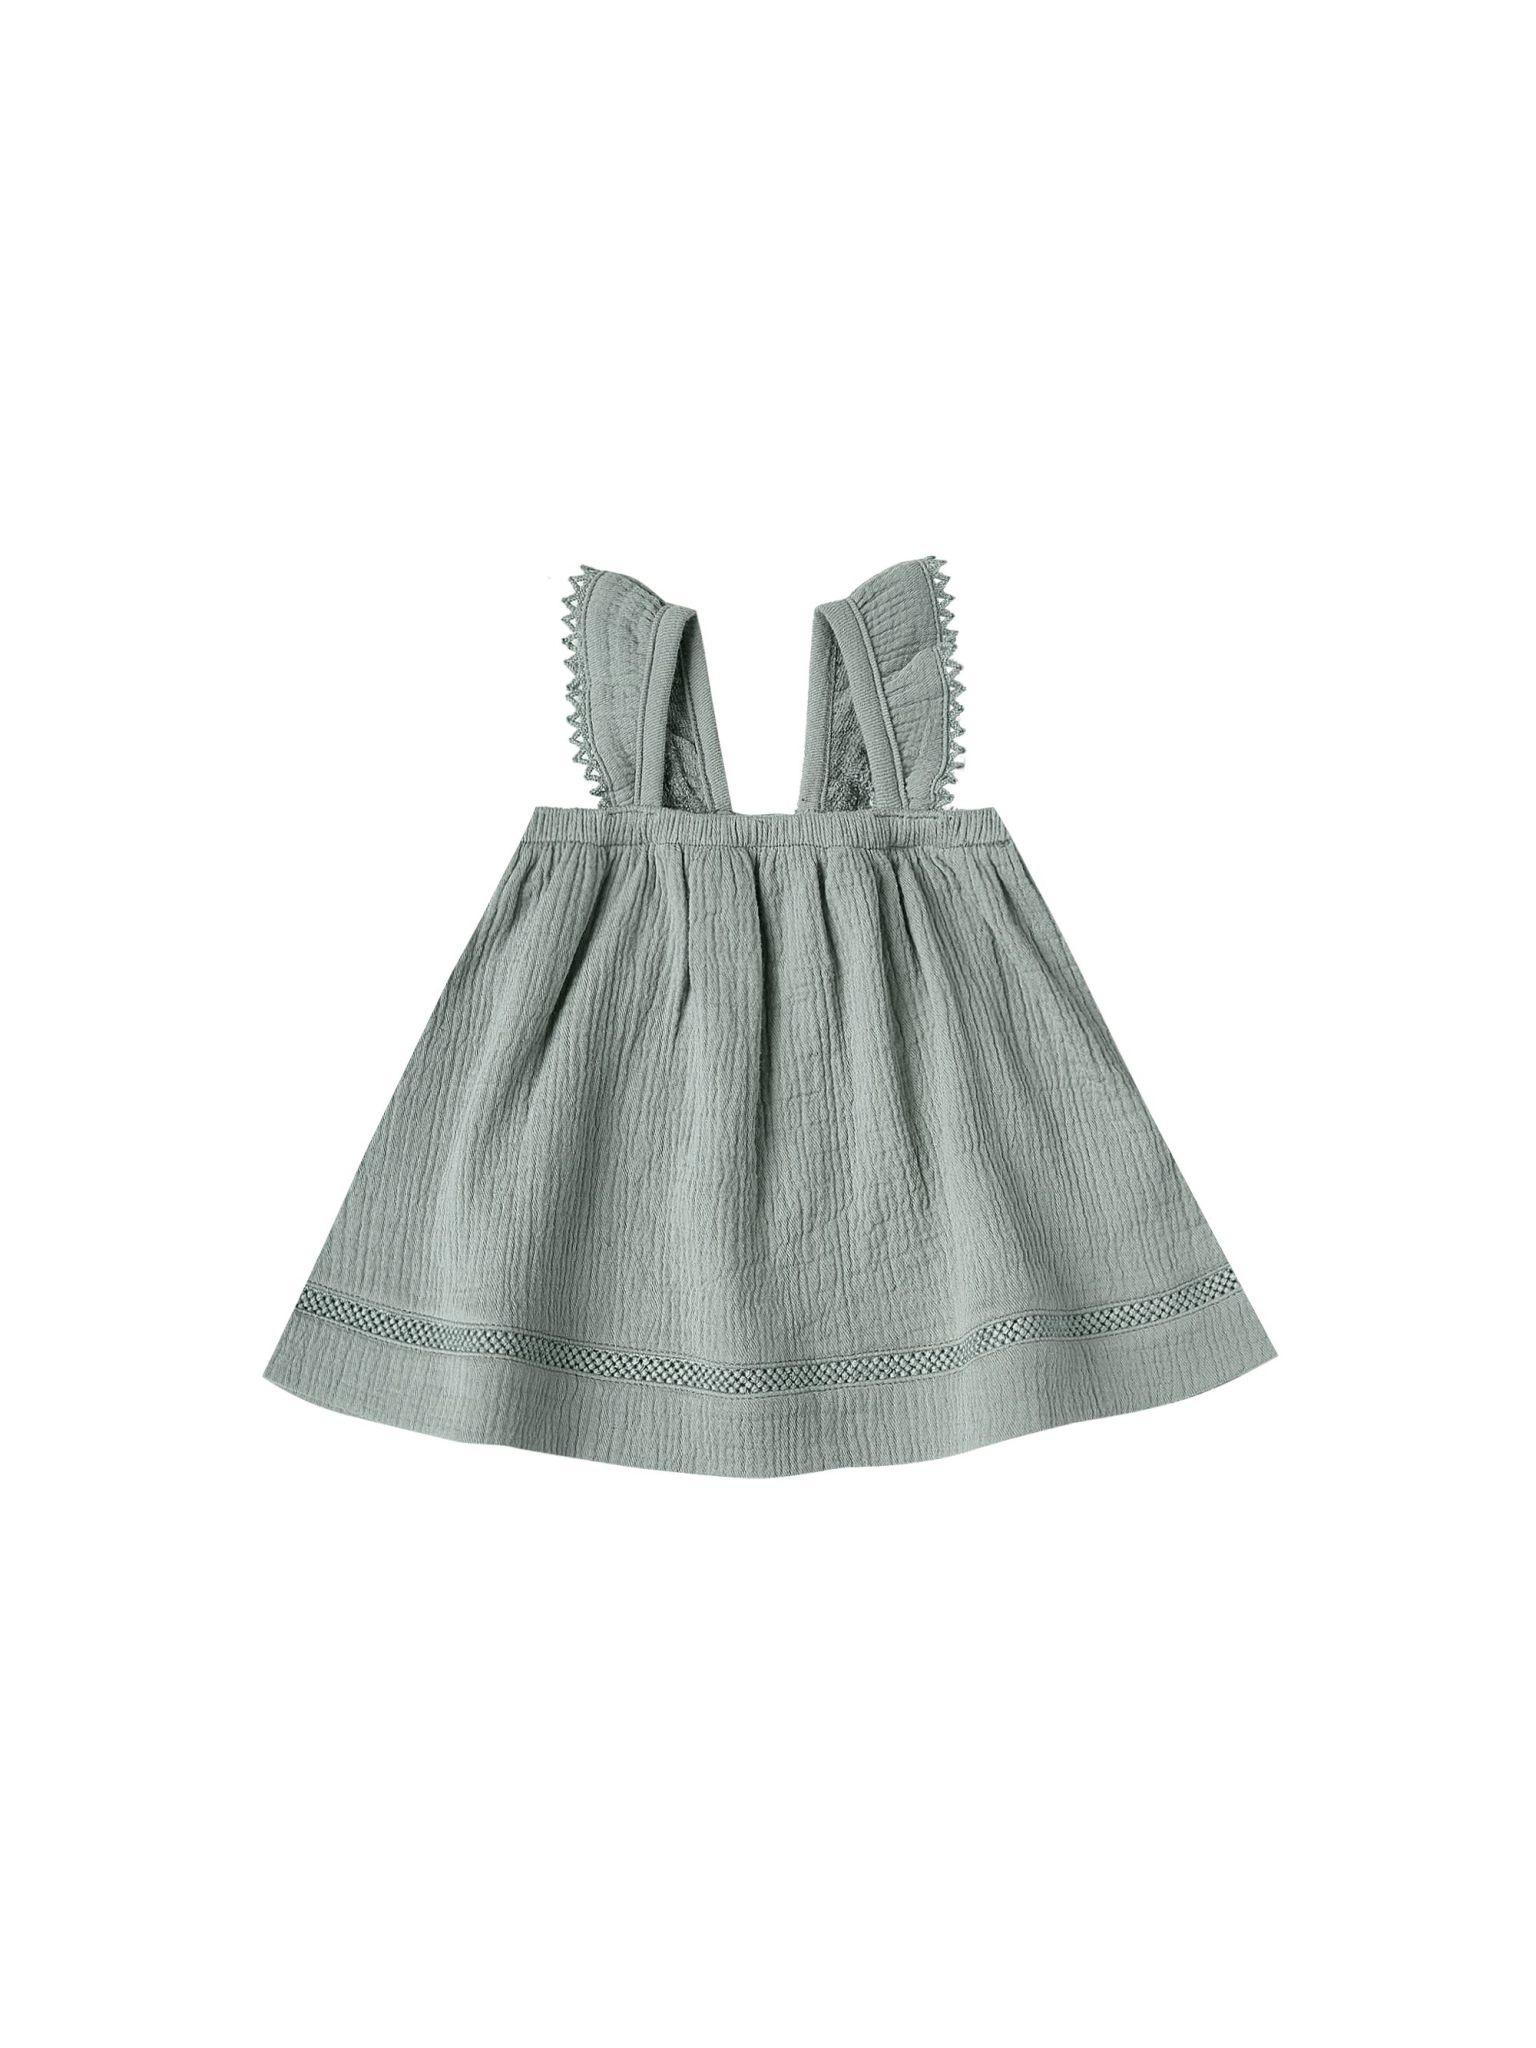 QUINCY MAE Organic Cotton Ruffled Tube Dress